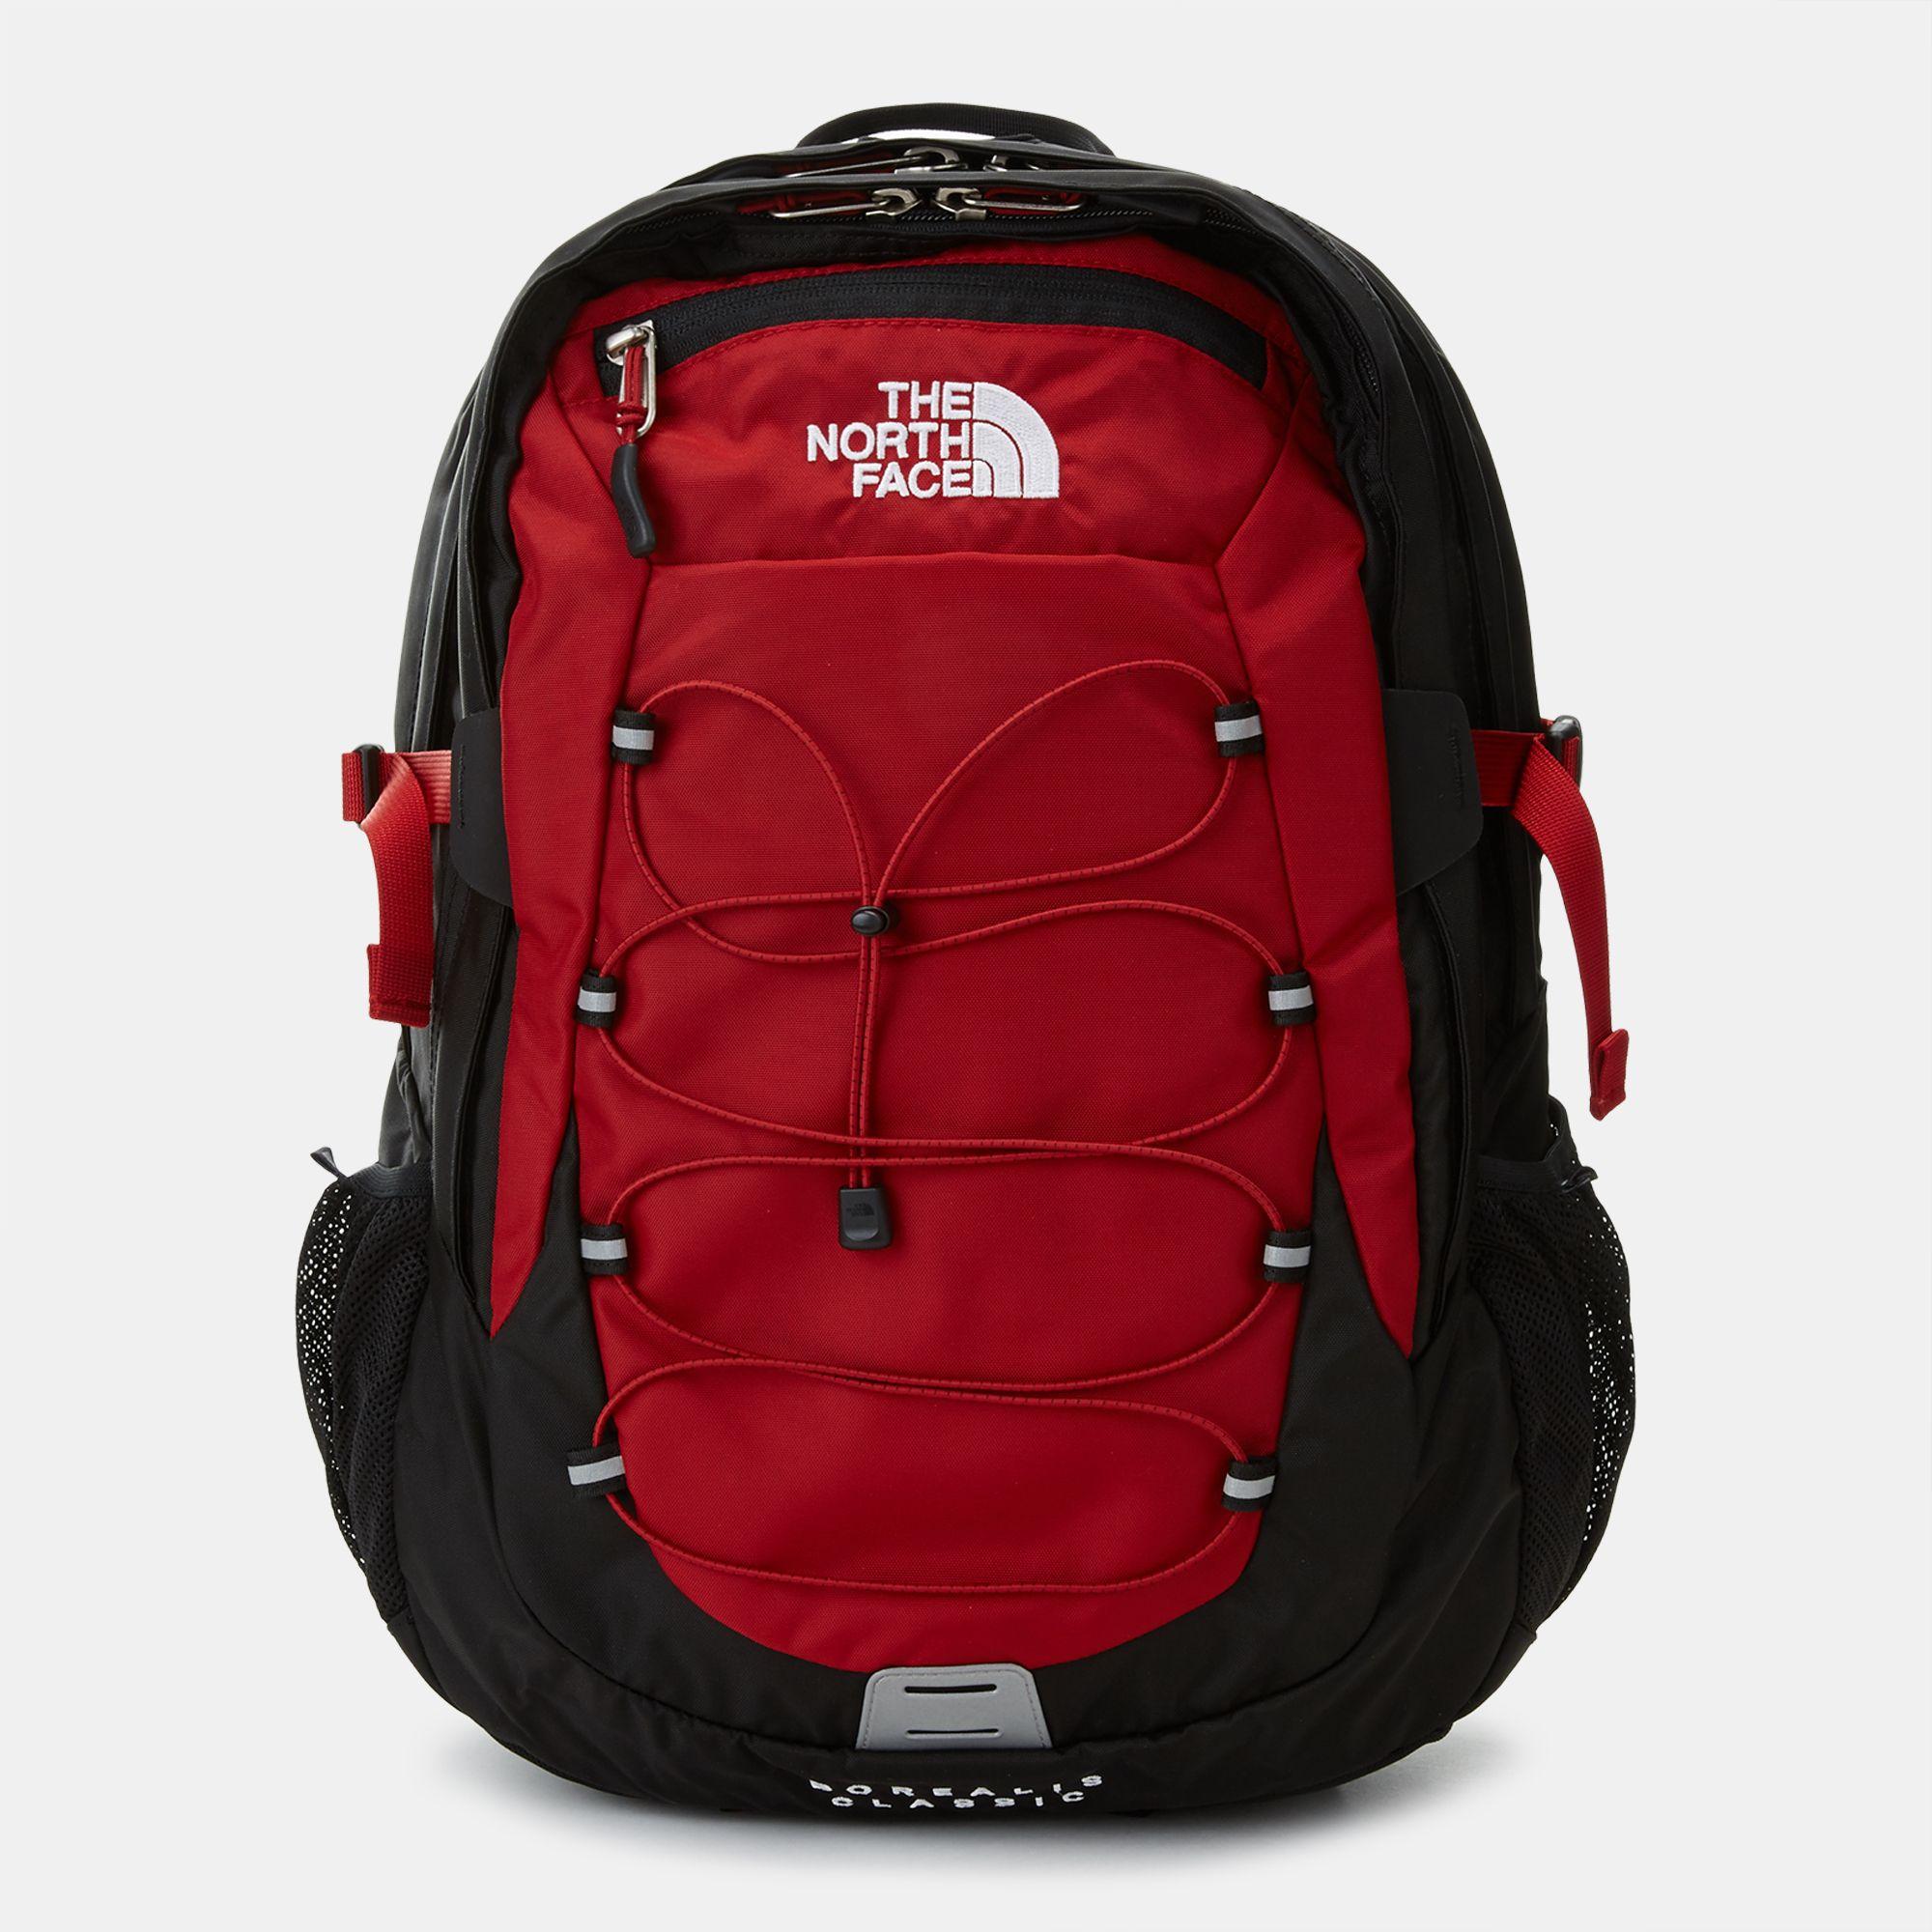 a9929a91d The North Face Borealis 15 Laptop Backpack- Fenix Toulouse Handball